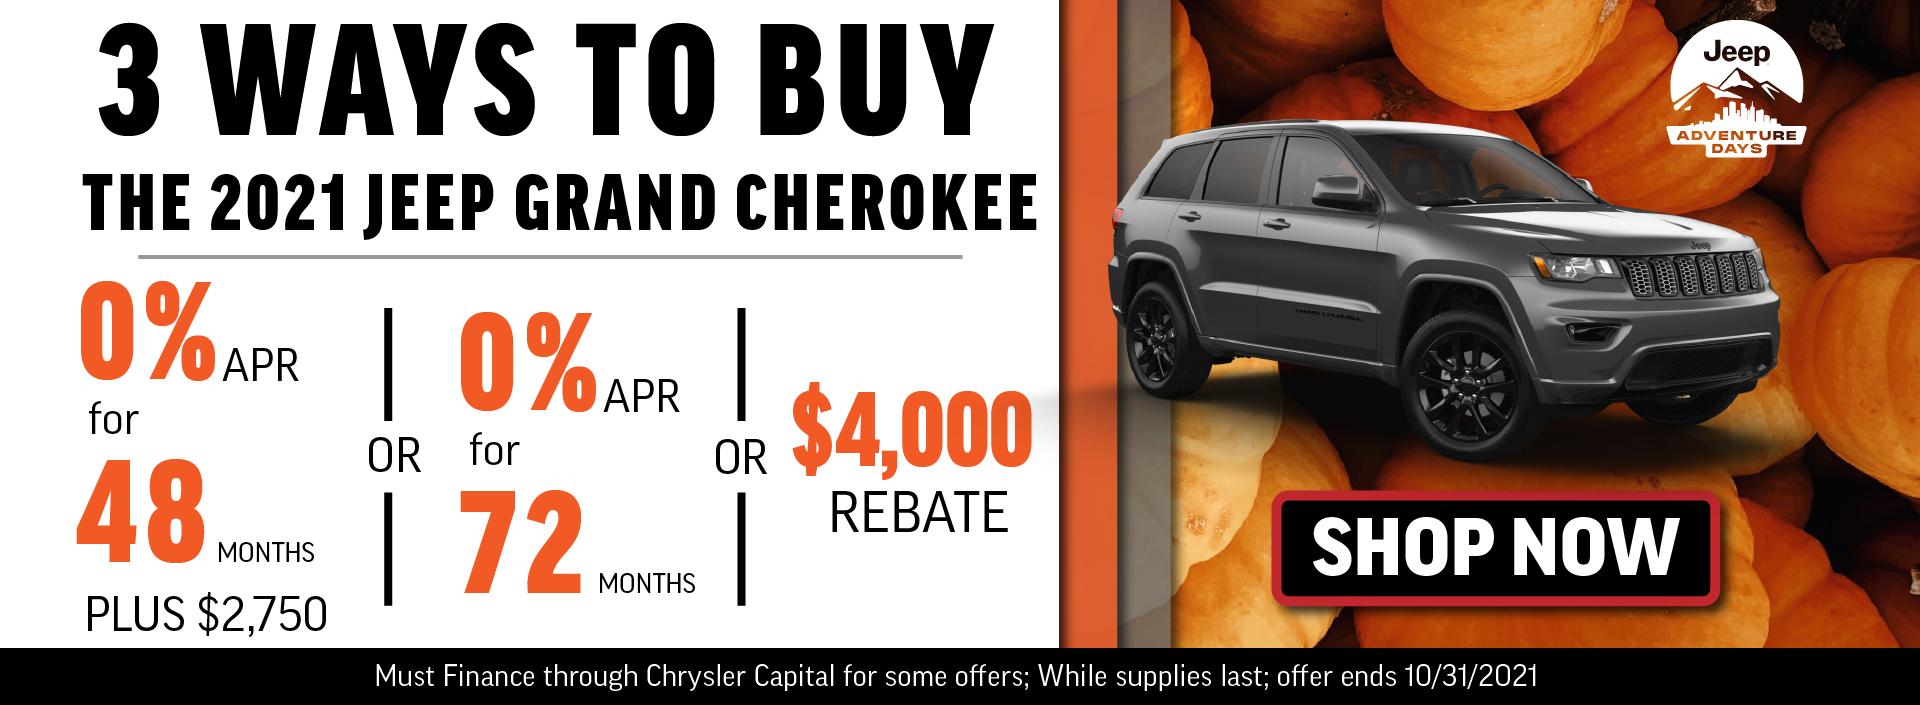 2021 Jeep Grand Cherokee_October